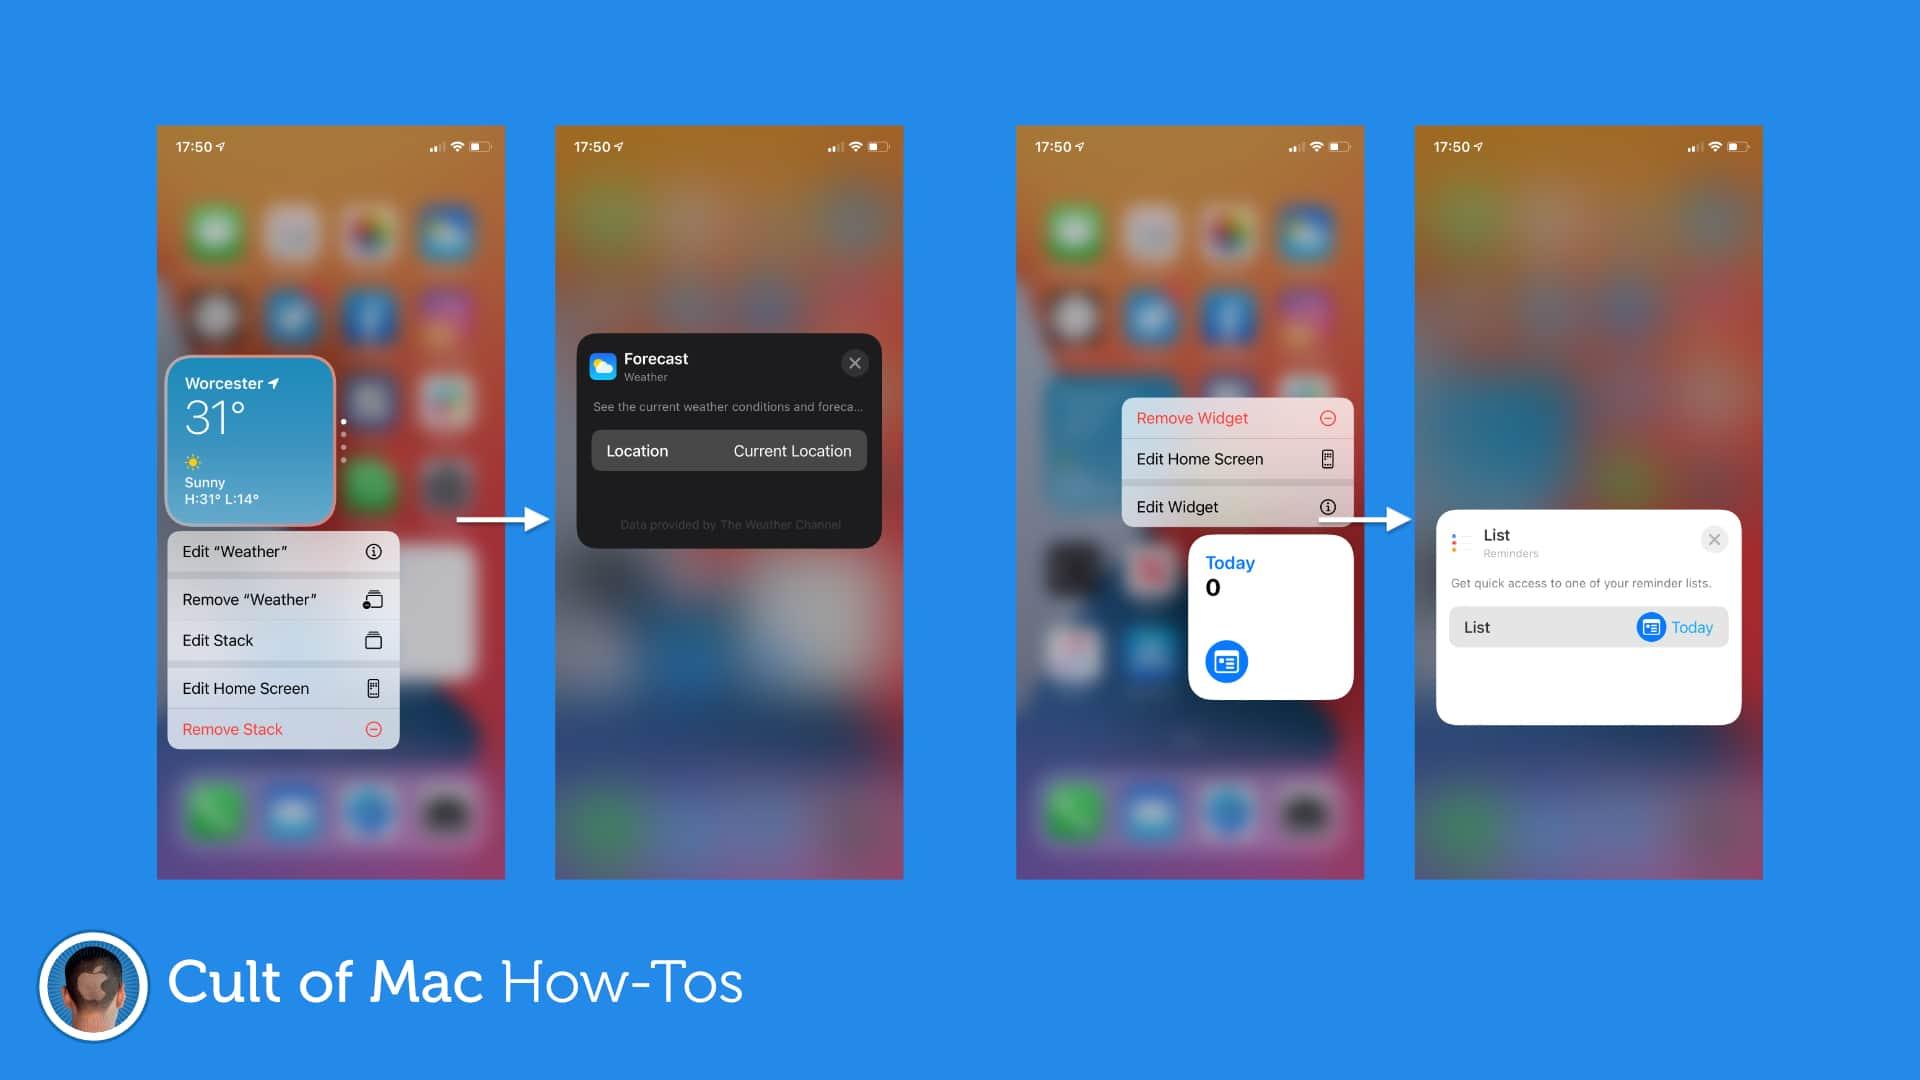 How to edit widgets in iOS 14